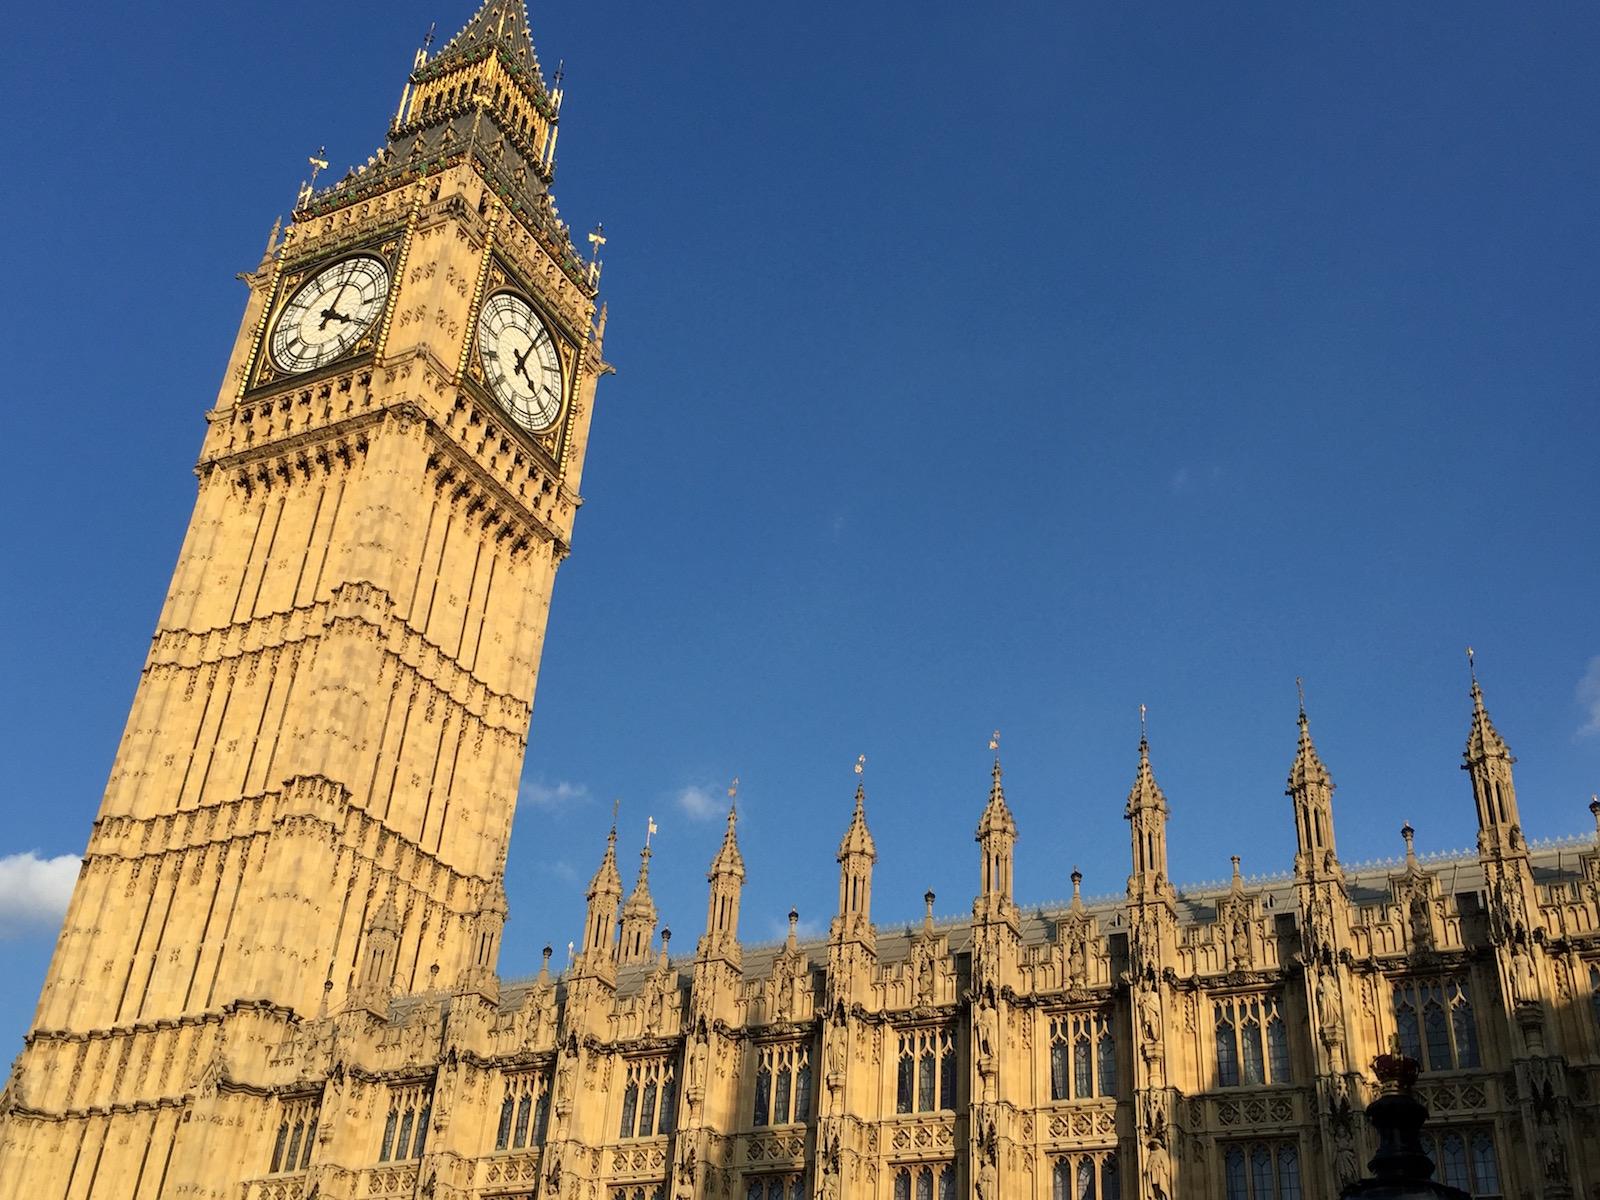 Big Ben, The Elizabeth Tower